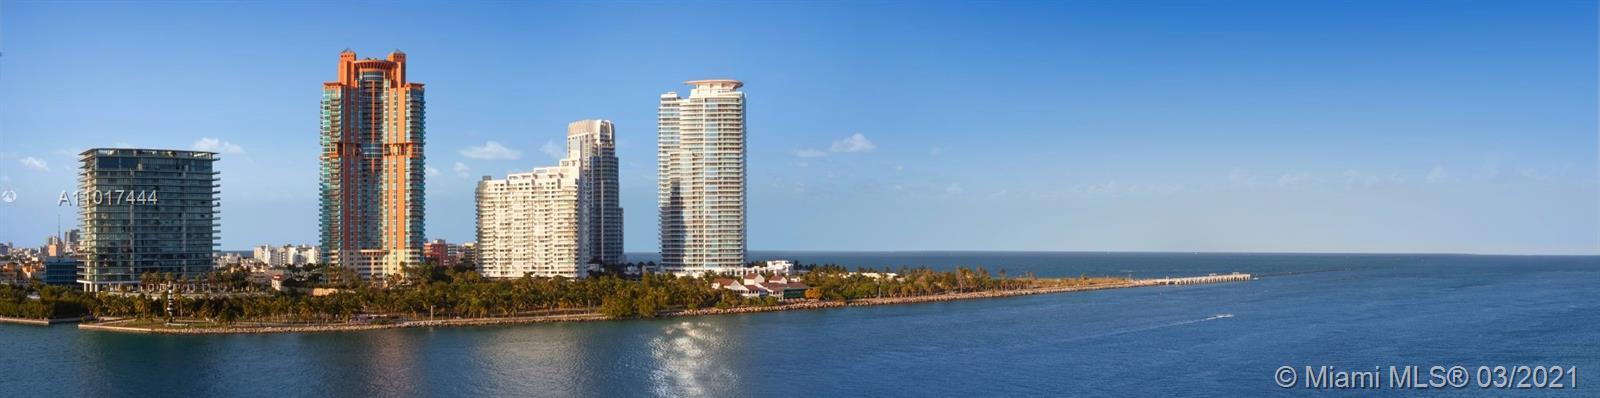 Palazzo Della Luna #6875 - 6800 Fisher Island Drive #6875, Fisher Island, FL 33109